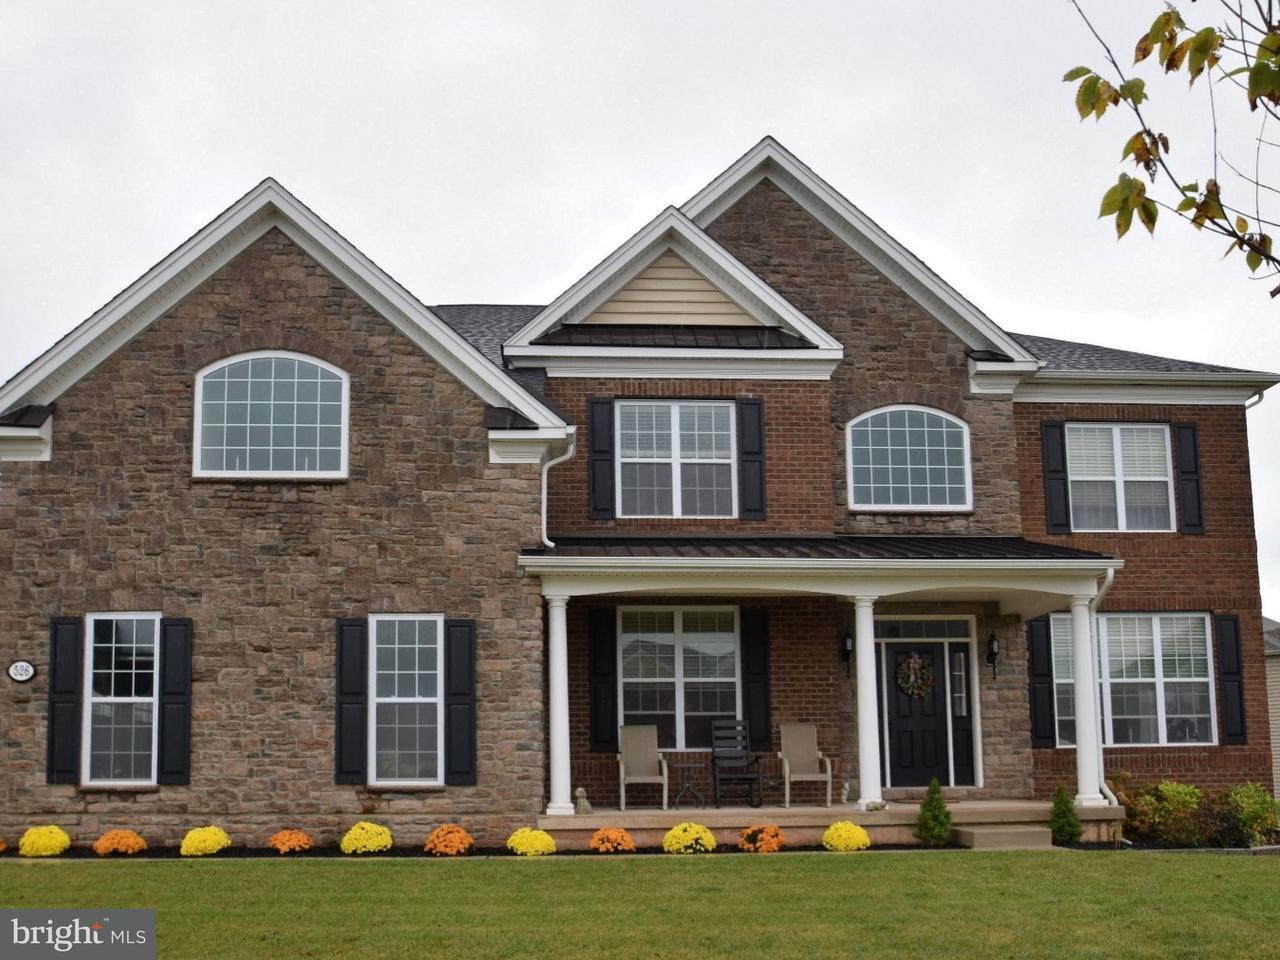 Single Family Home for Sale at 526 GRAYSON Lane Harleysville, Pennsylvania 19438 United States